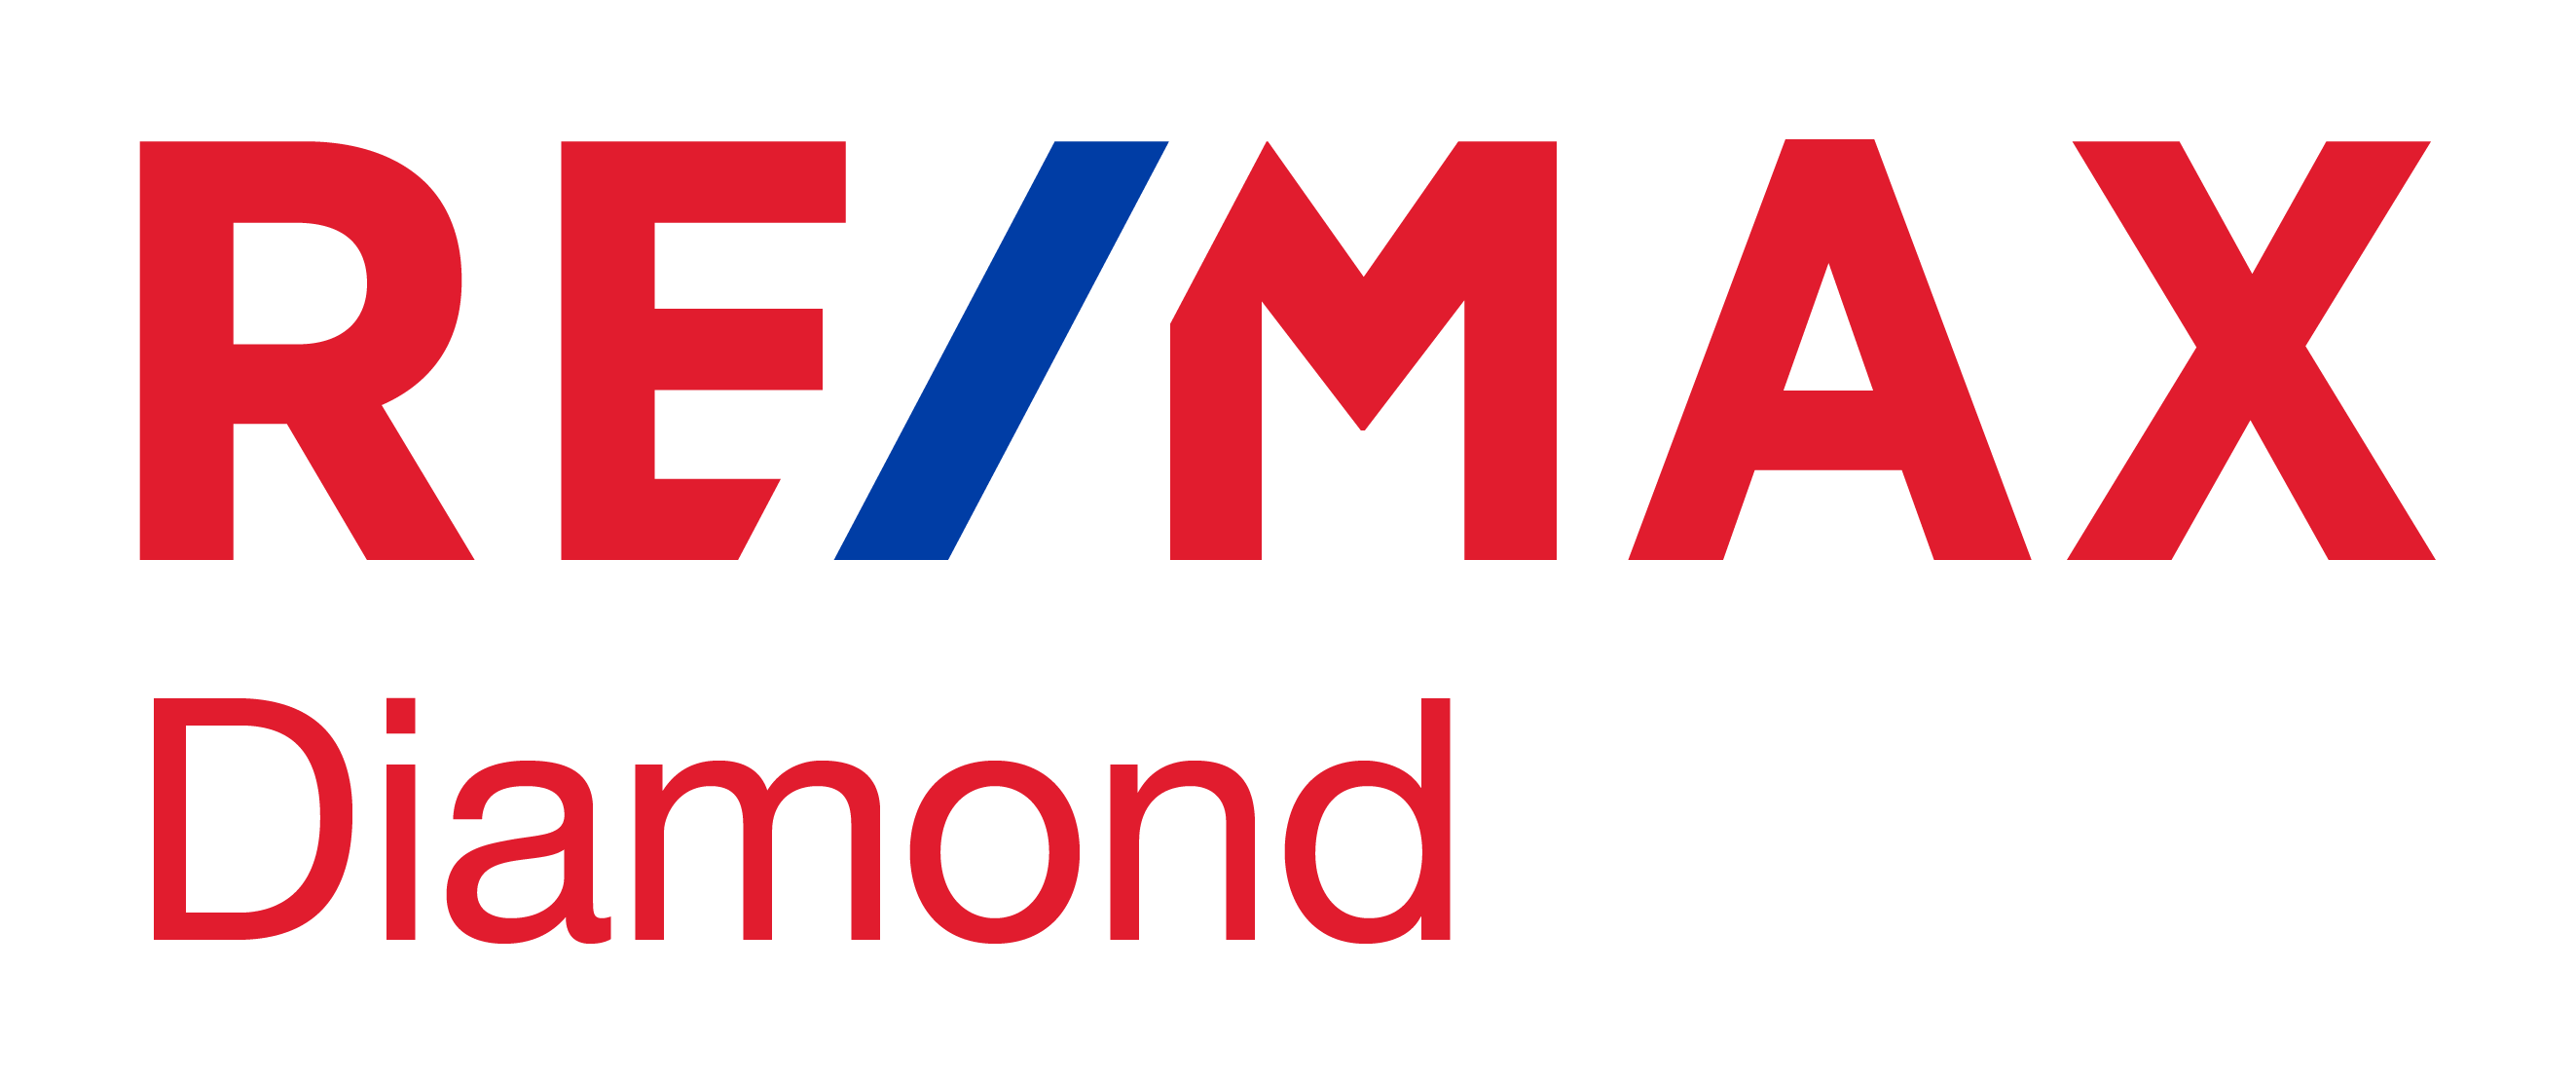 diamond.sk